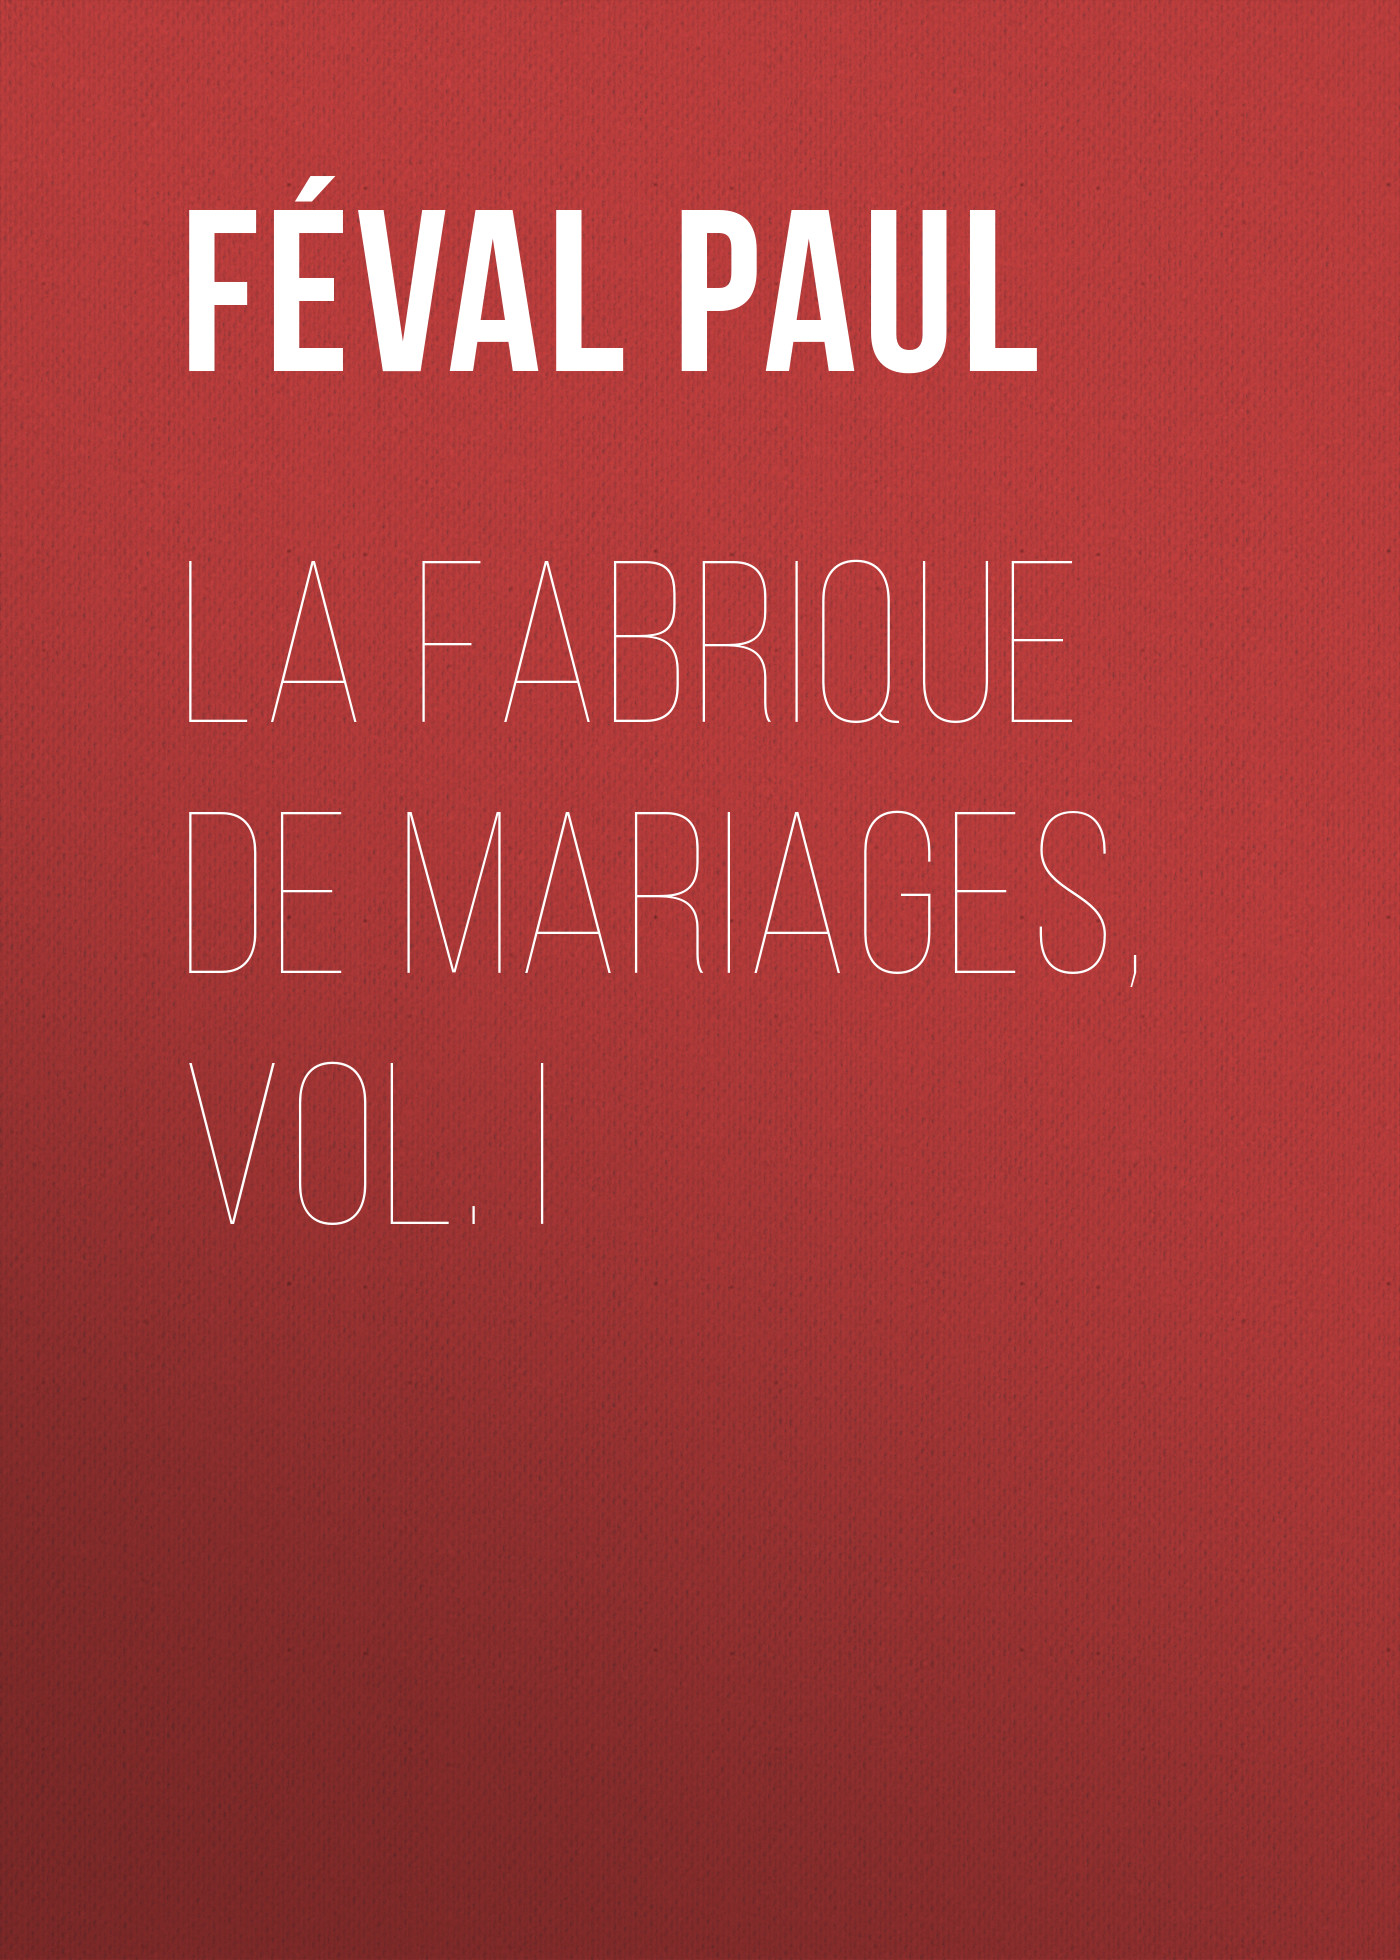 Féval Paul La fabrique de mariages, Vol. I féval paul la fabrique de mariages vol iii